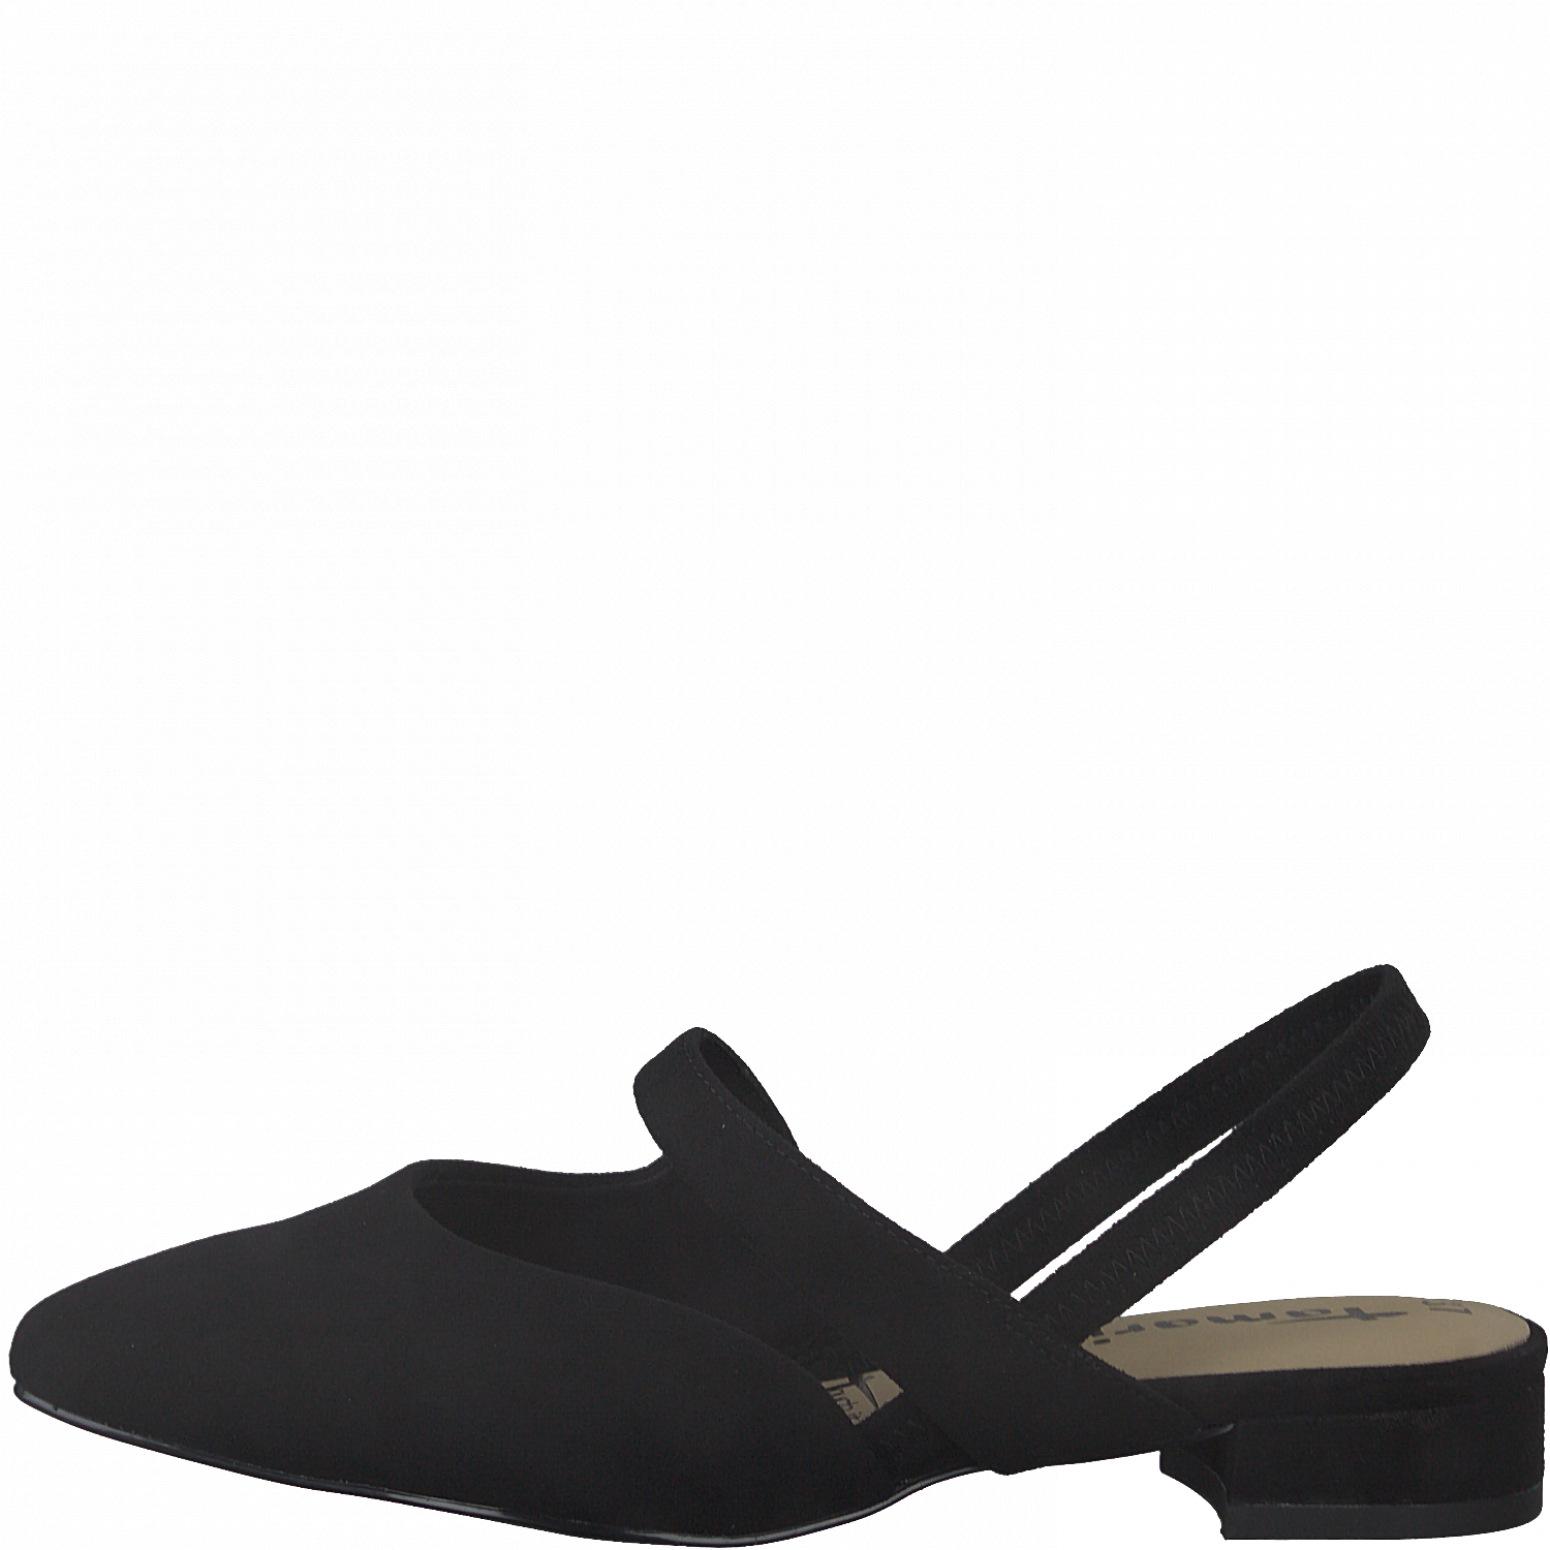 Tamaris 29417 sandal, black, 36